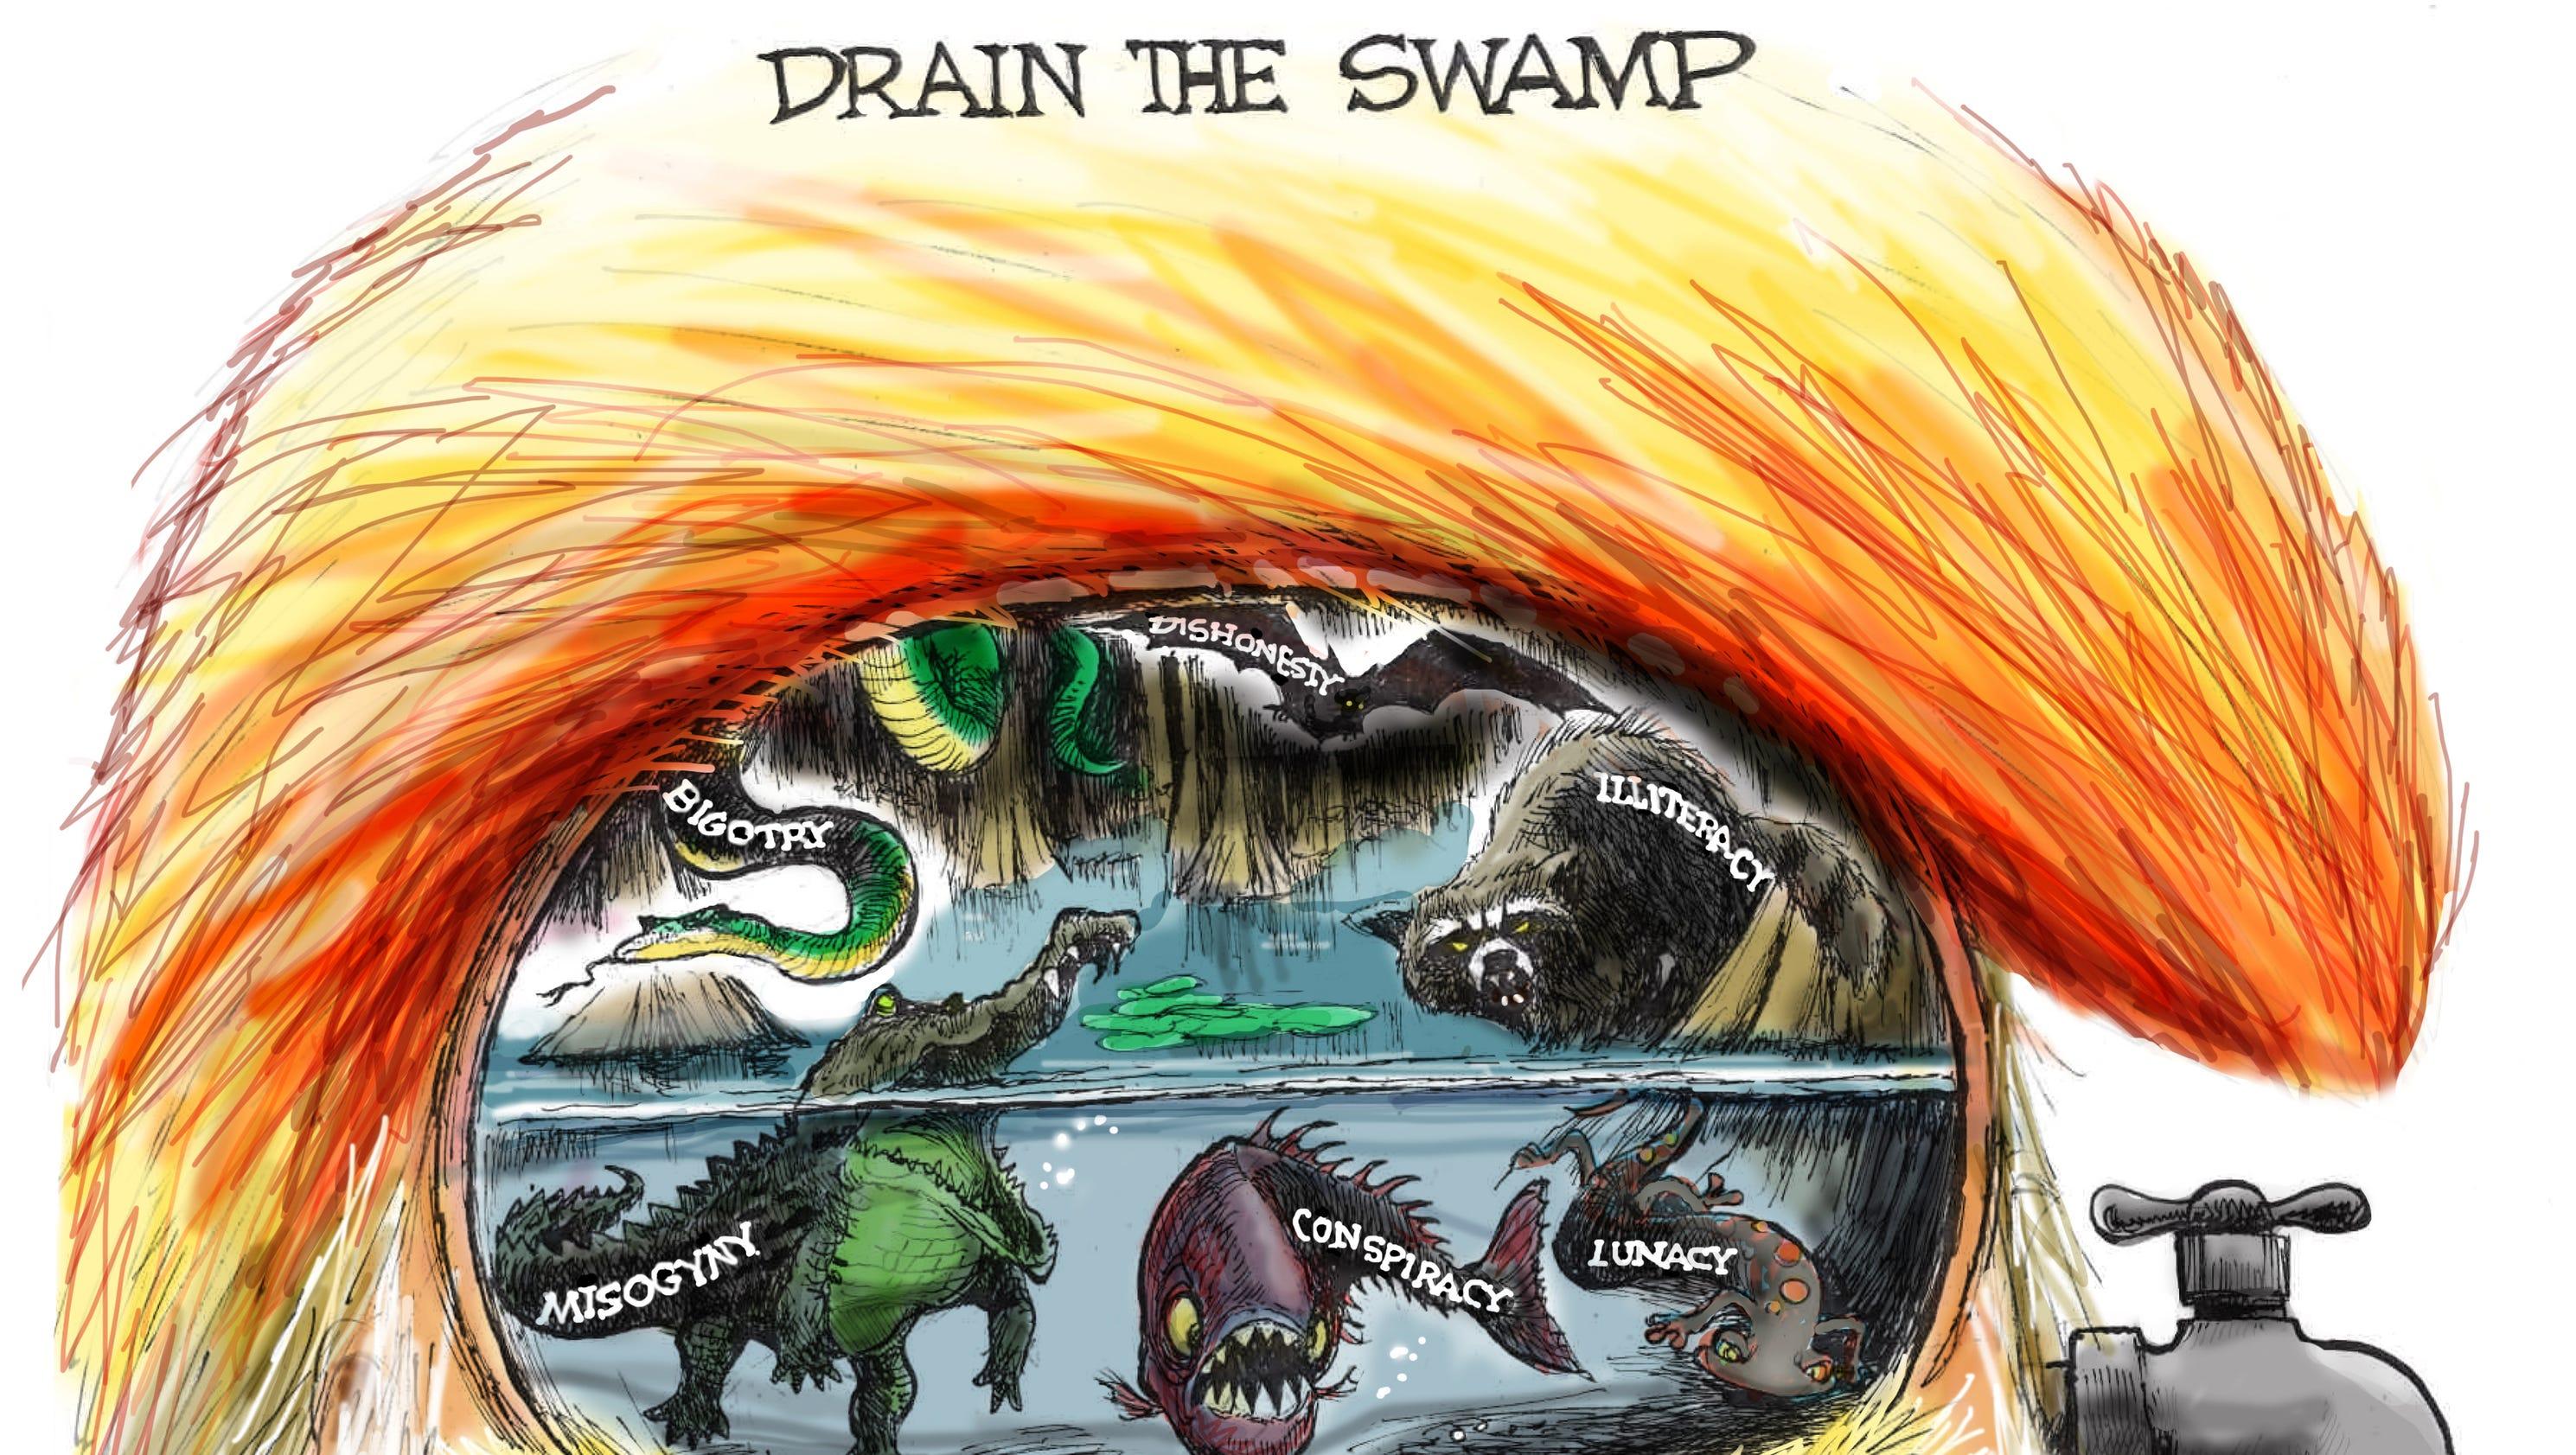 Benson: What lurks inside Donald Trump's brain